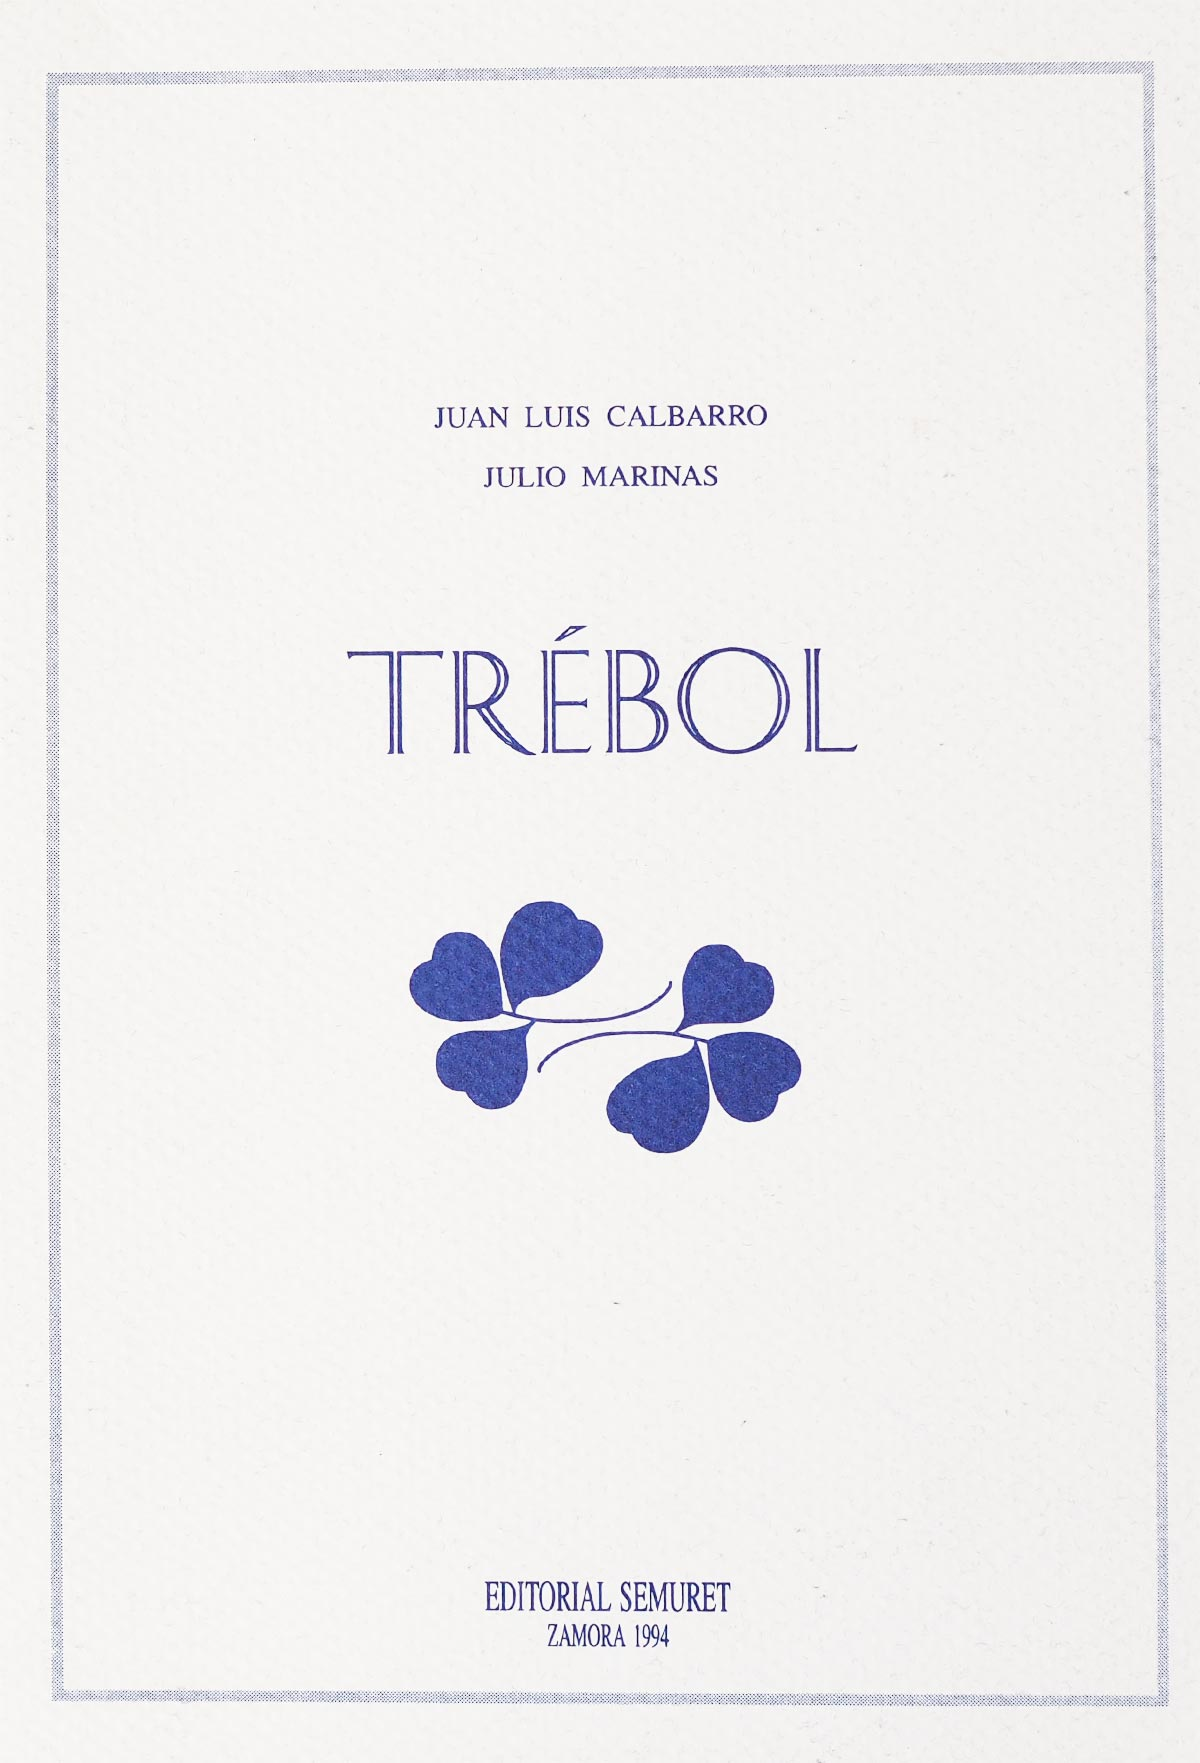 trebol-juan-luis-calbarro-morales-julio-marinas-editorial-semuret